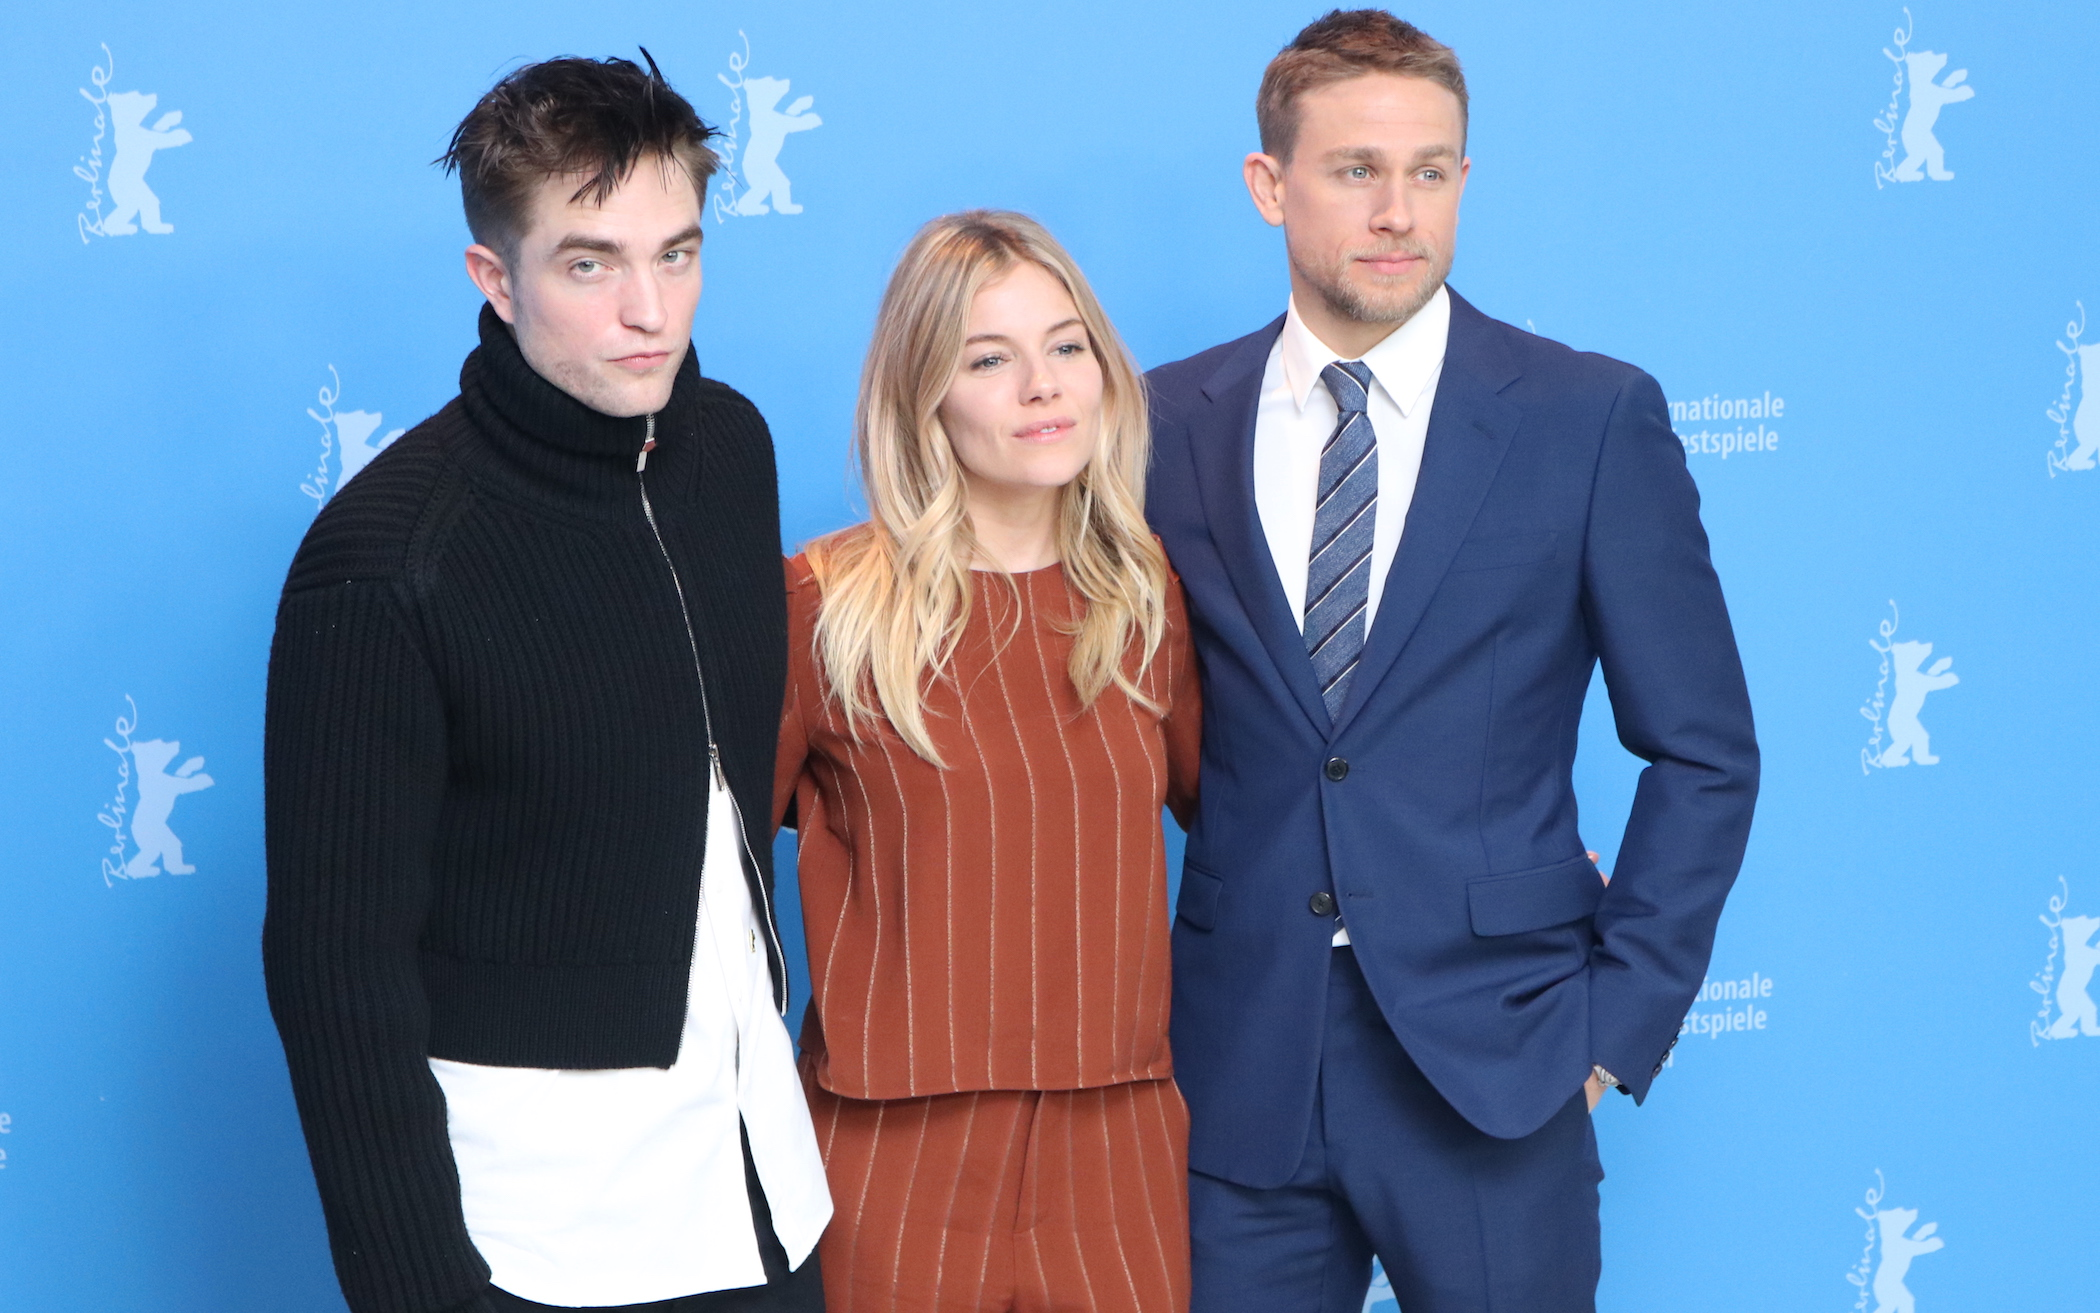 Berlino 2017: Robert Pattinson, Sienna Miller e Charlie Hunnam al photocall di Z - la città perduta